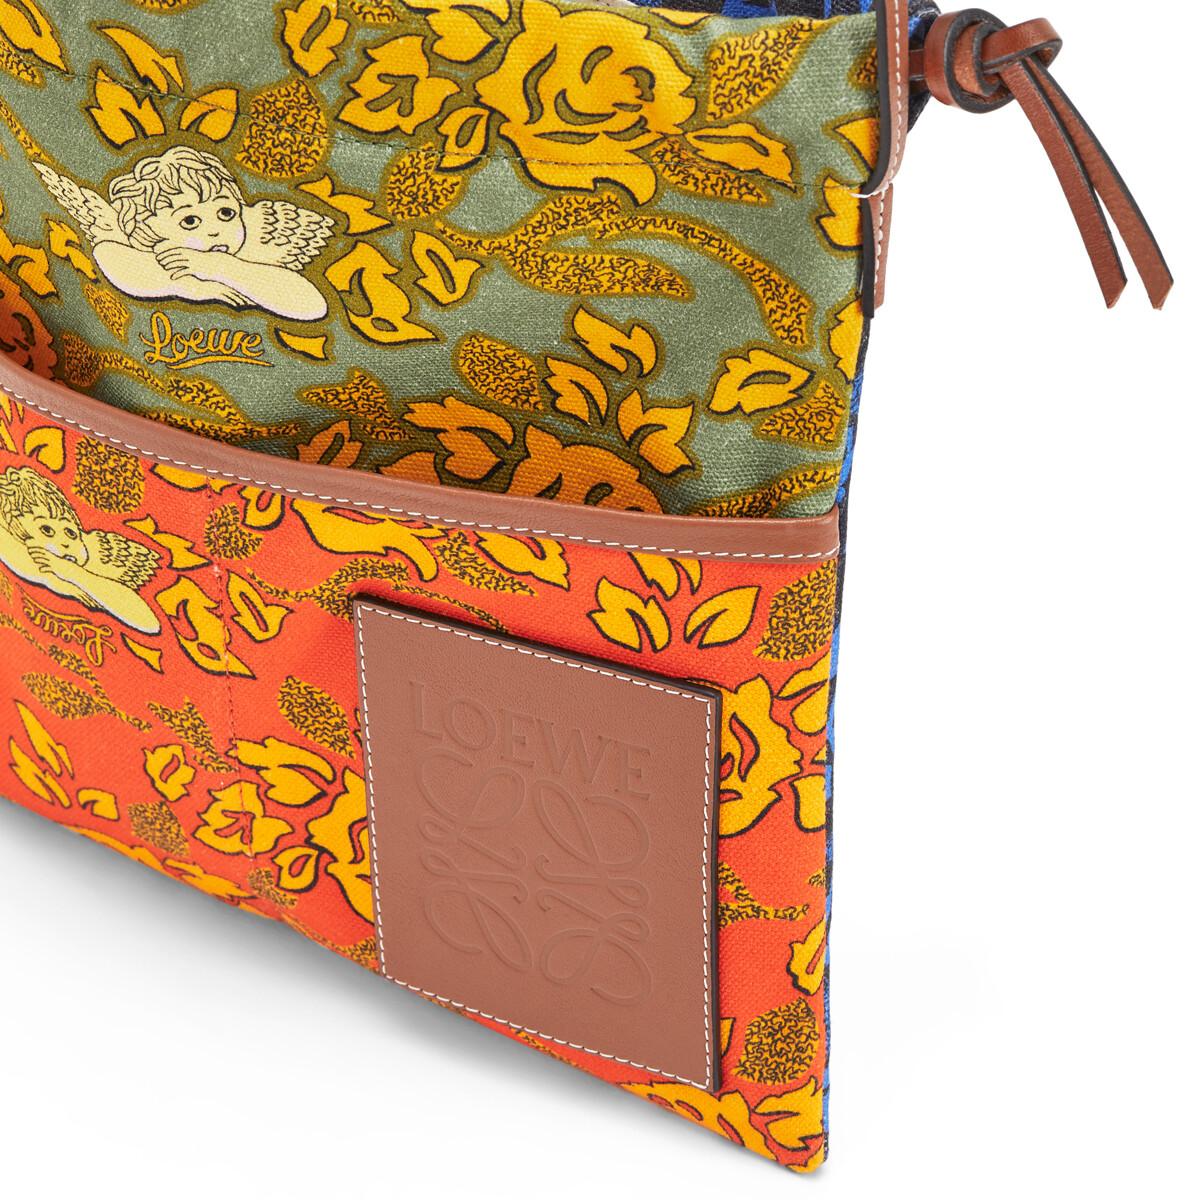 LOEWE Paula's Small Drawstring Pouch Orange/Green front